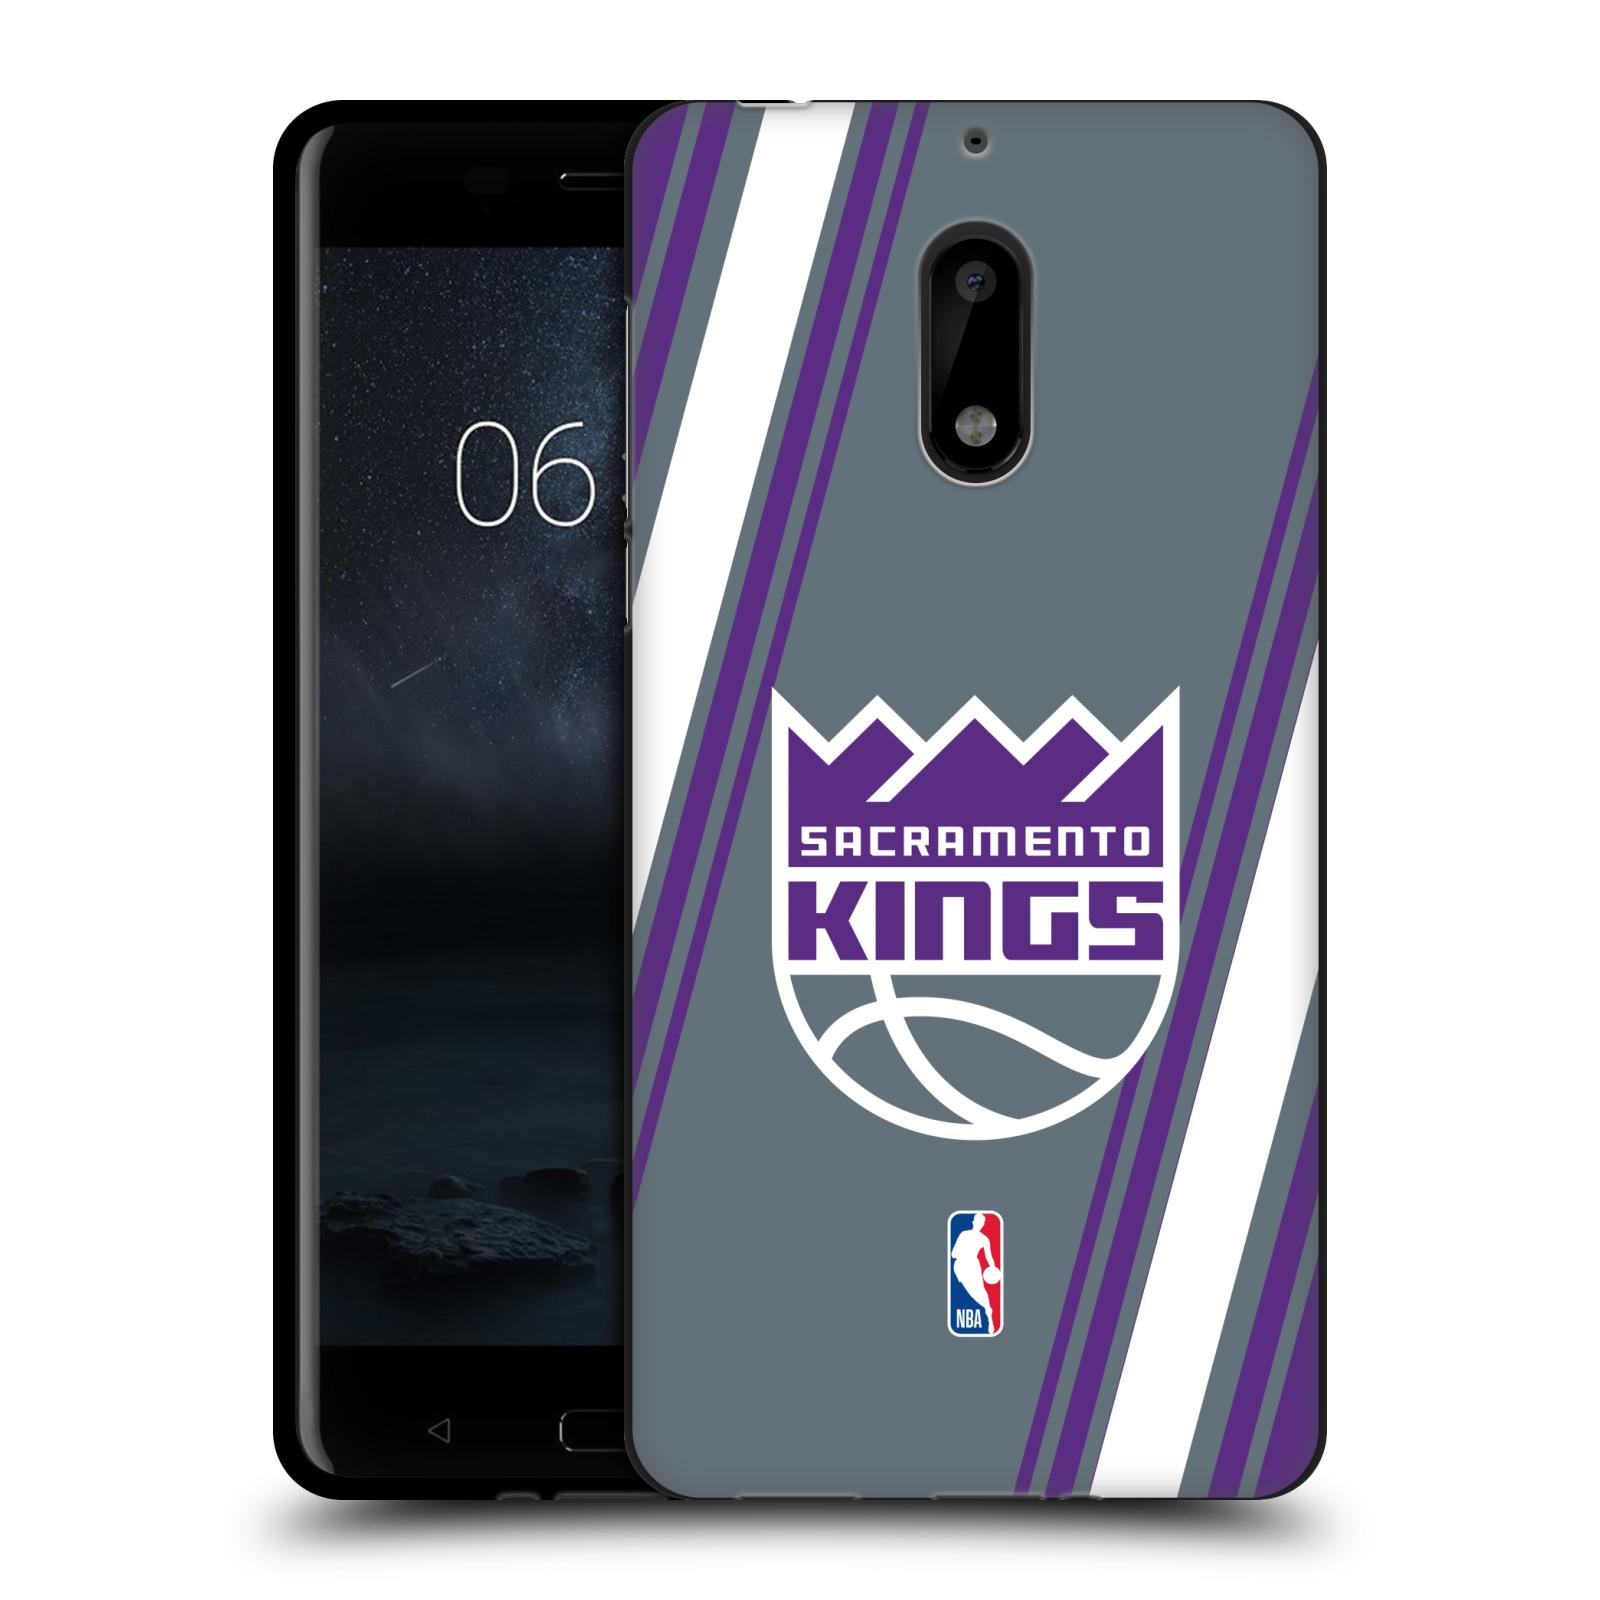 OFFIZIELLE-NBA-SACRAMENTO-KINGS-GEL-HULLE-SCHWARZ-FUR-MICROSOFT-NOKIA-HANDYS